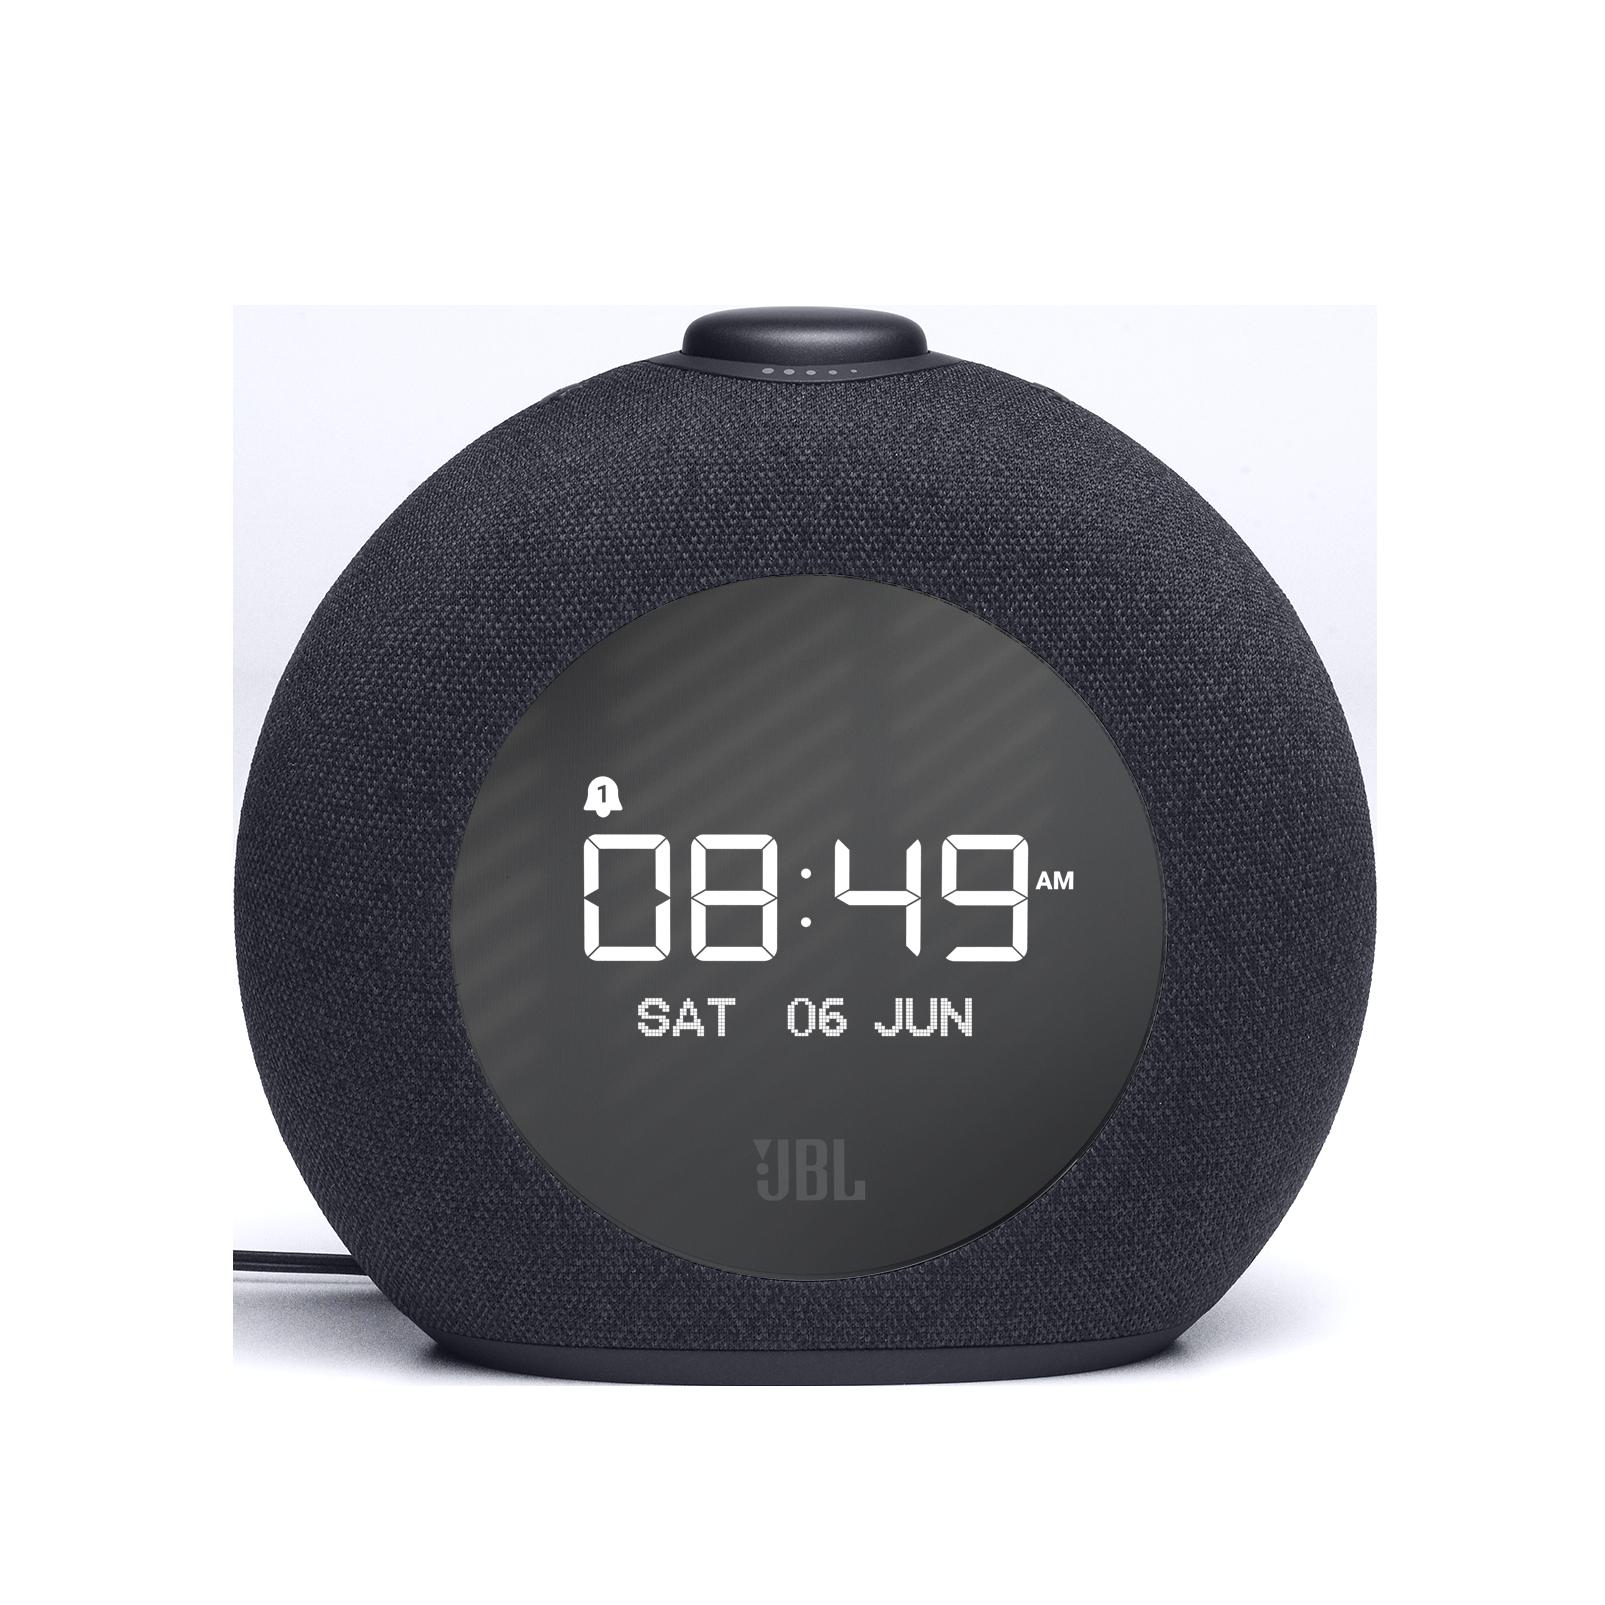 JBL Horizon 2 DAB - Black - Bluetooth clock radio speaker with DAB/DAB+/FM - Front